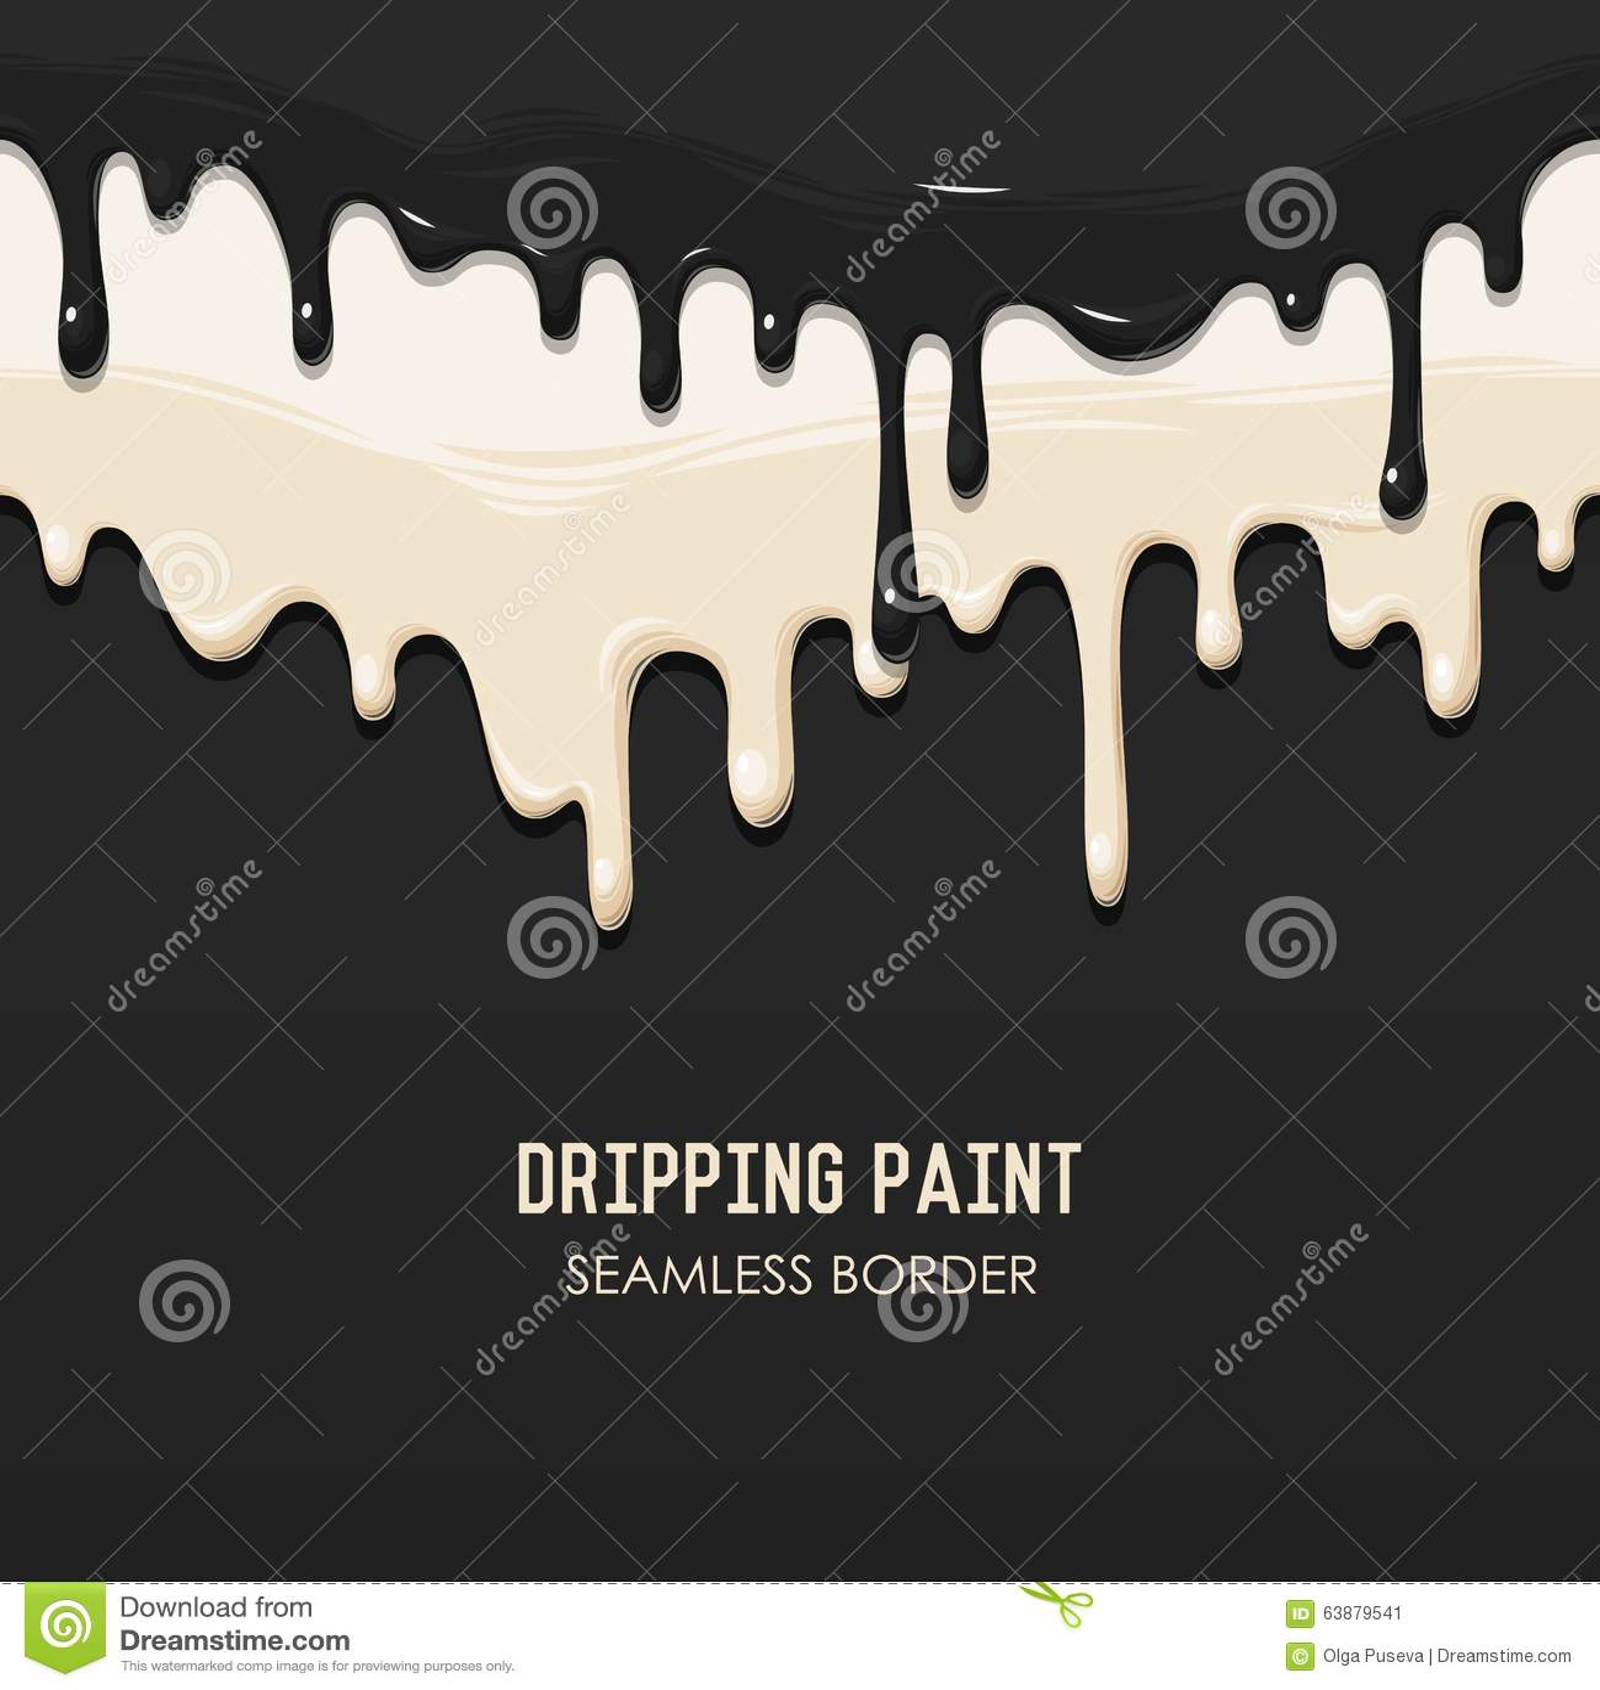 Border Clip Art Dripping Background